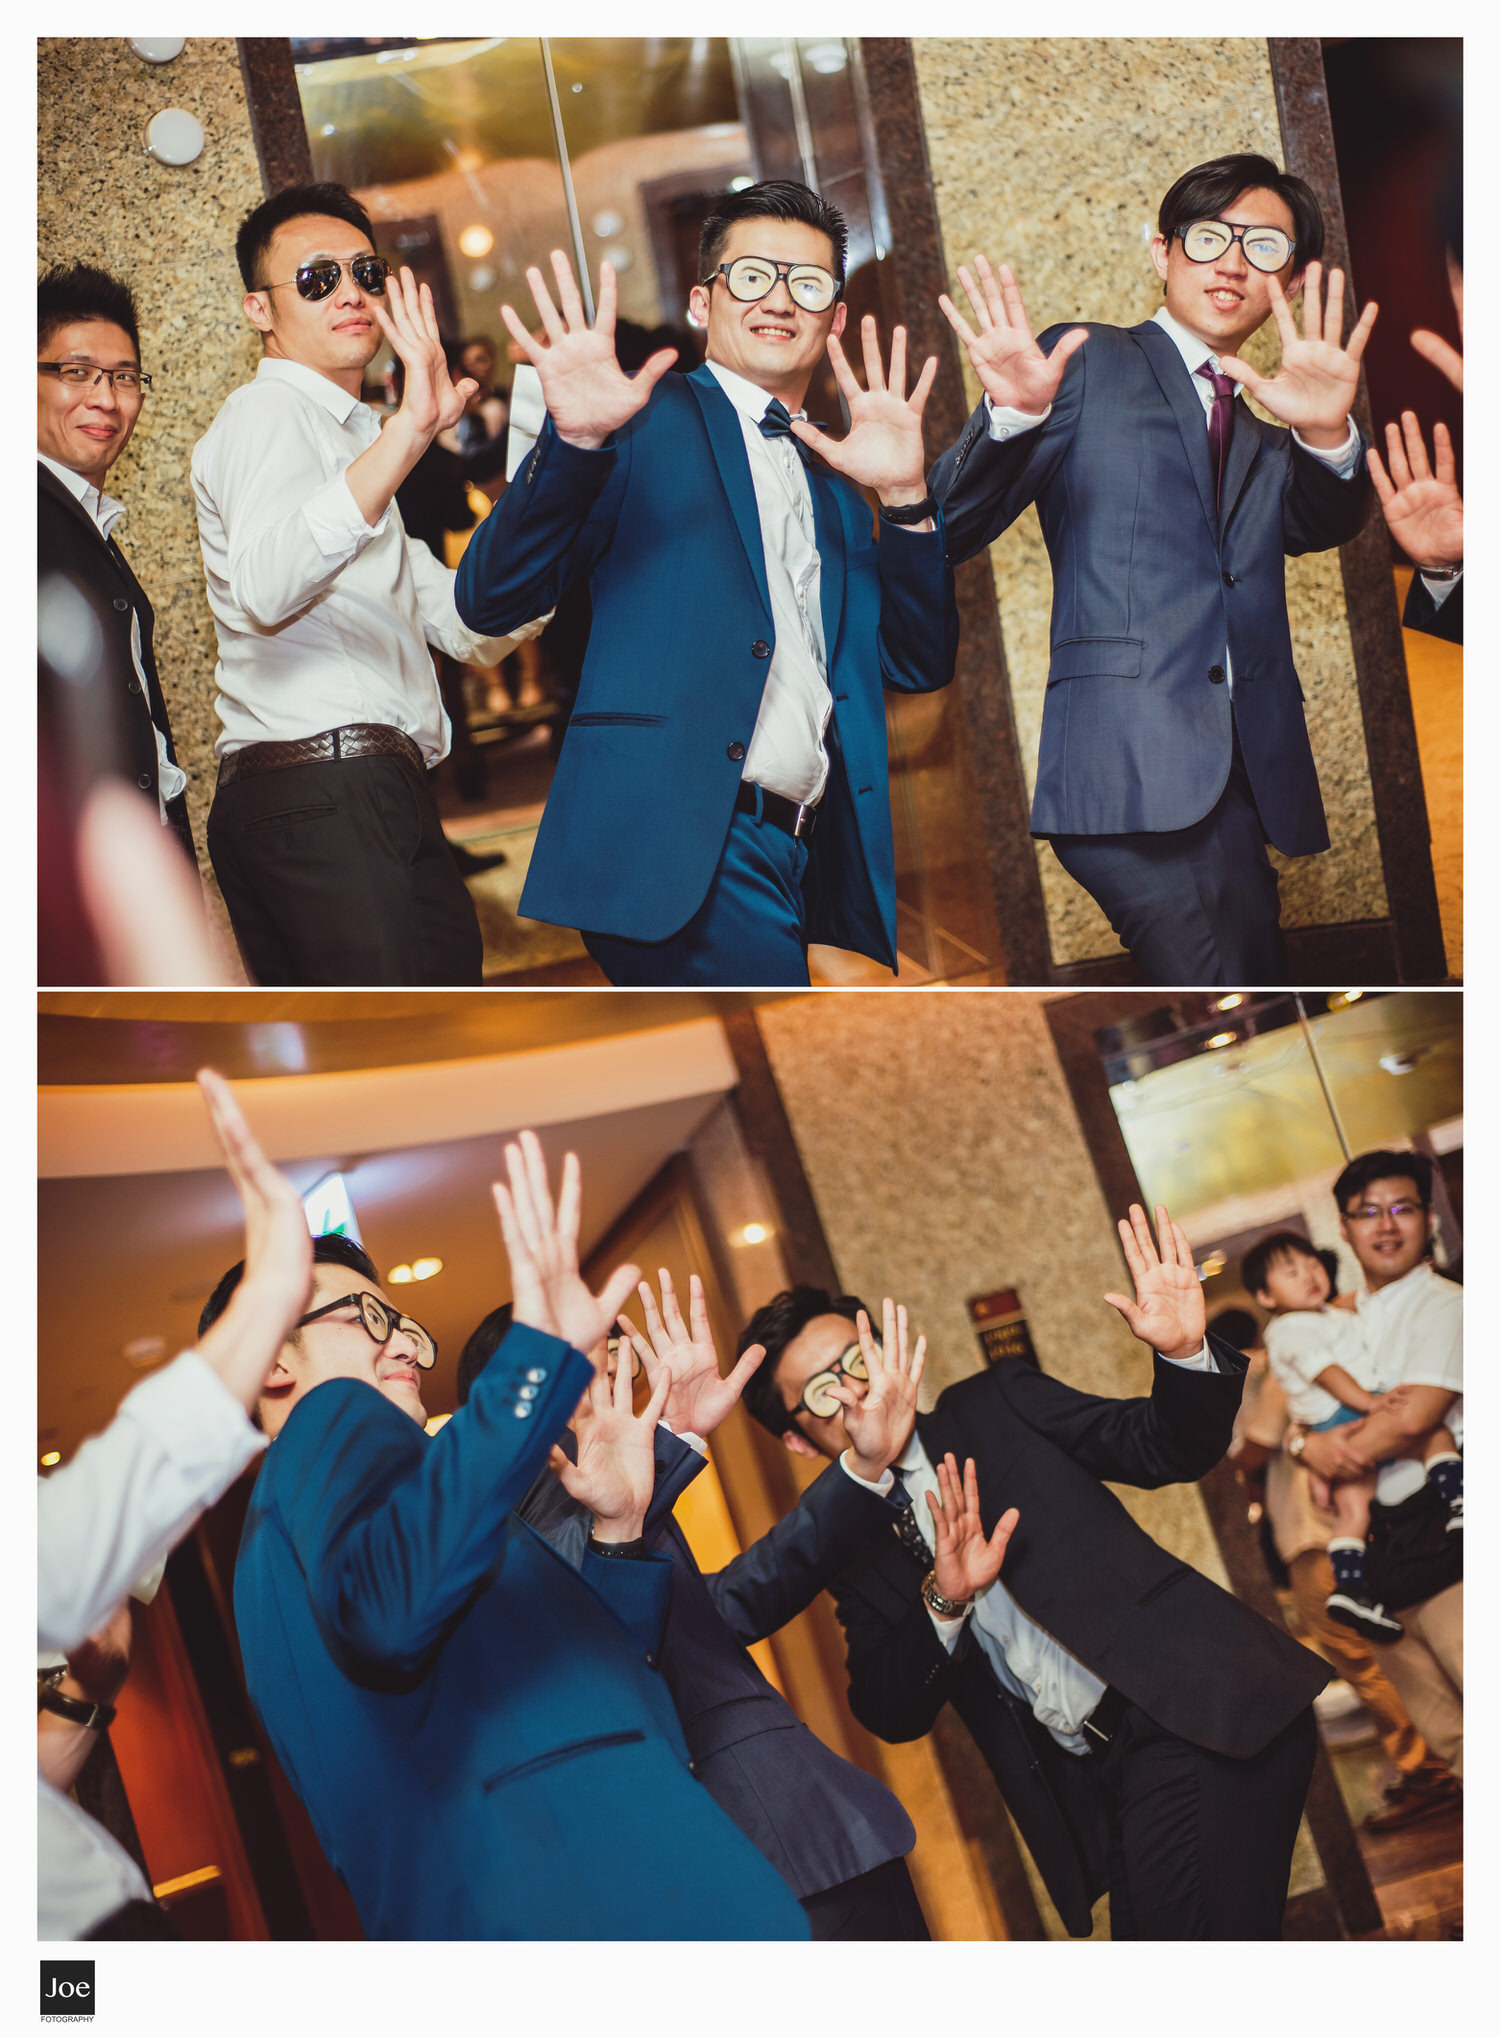 wedding-photography-shangri-la-far-eastern-plaza-hotel-ariel-sam-joe-fotography-053.jpg